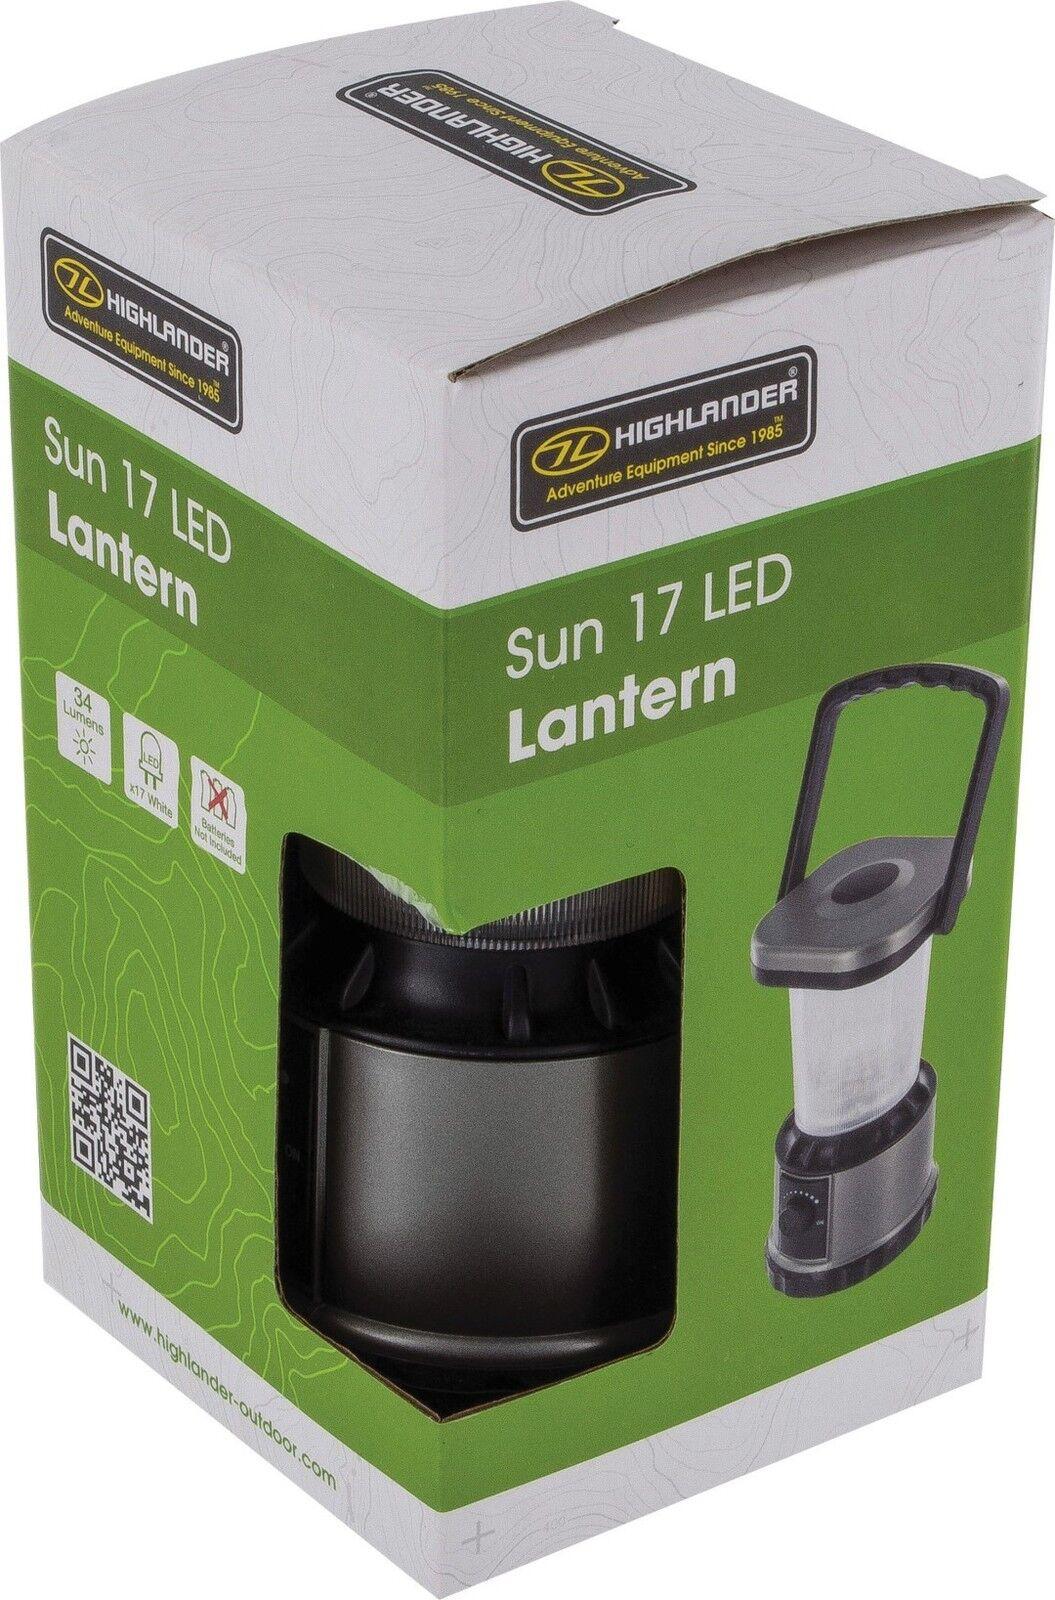 Sun 17 17 17 led lanterne-led camping lanterne avec dimmer fonction militaire outdoors c3ad9d